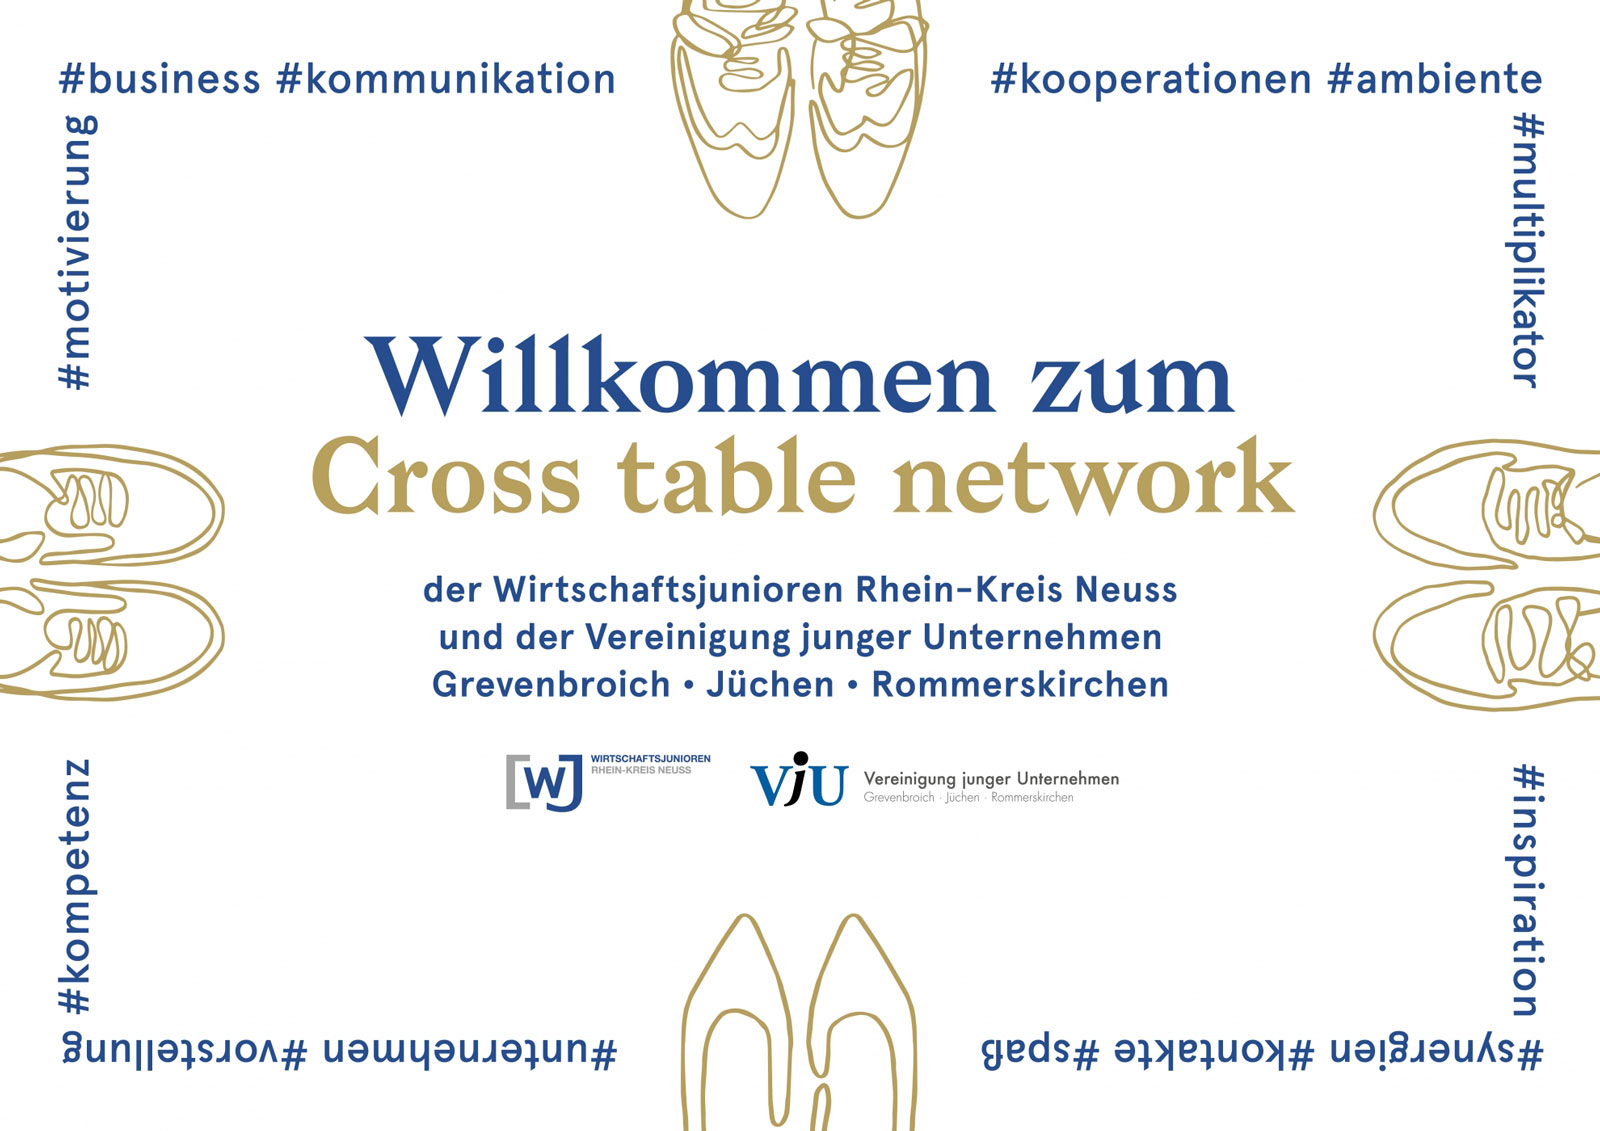 Designbüro Mittelsdorf Cross table network → Branding, Printmedien, Veranstaltung